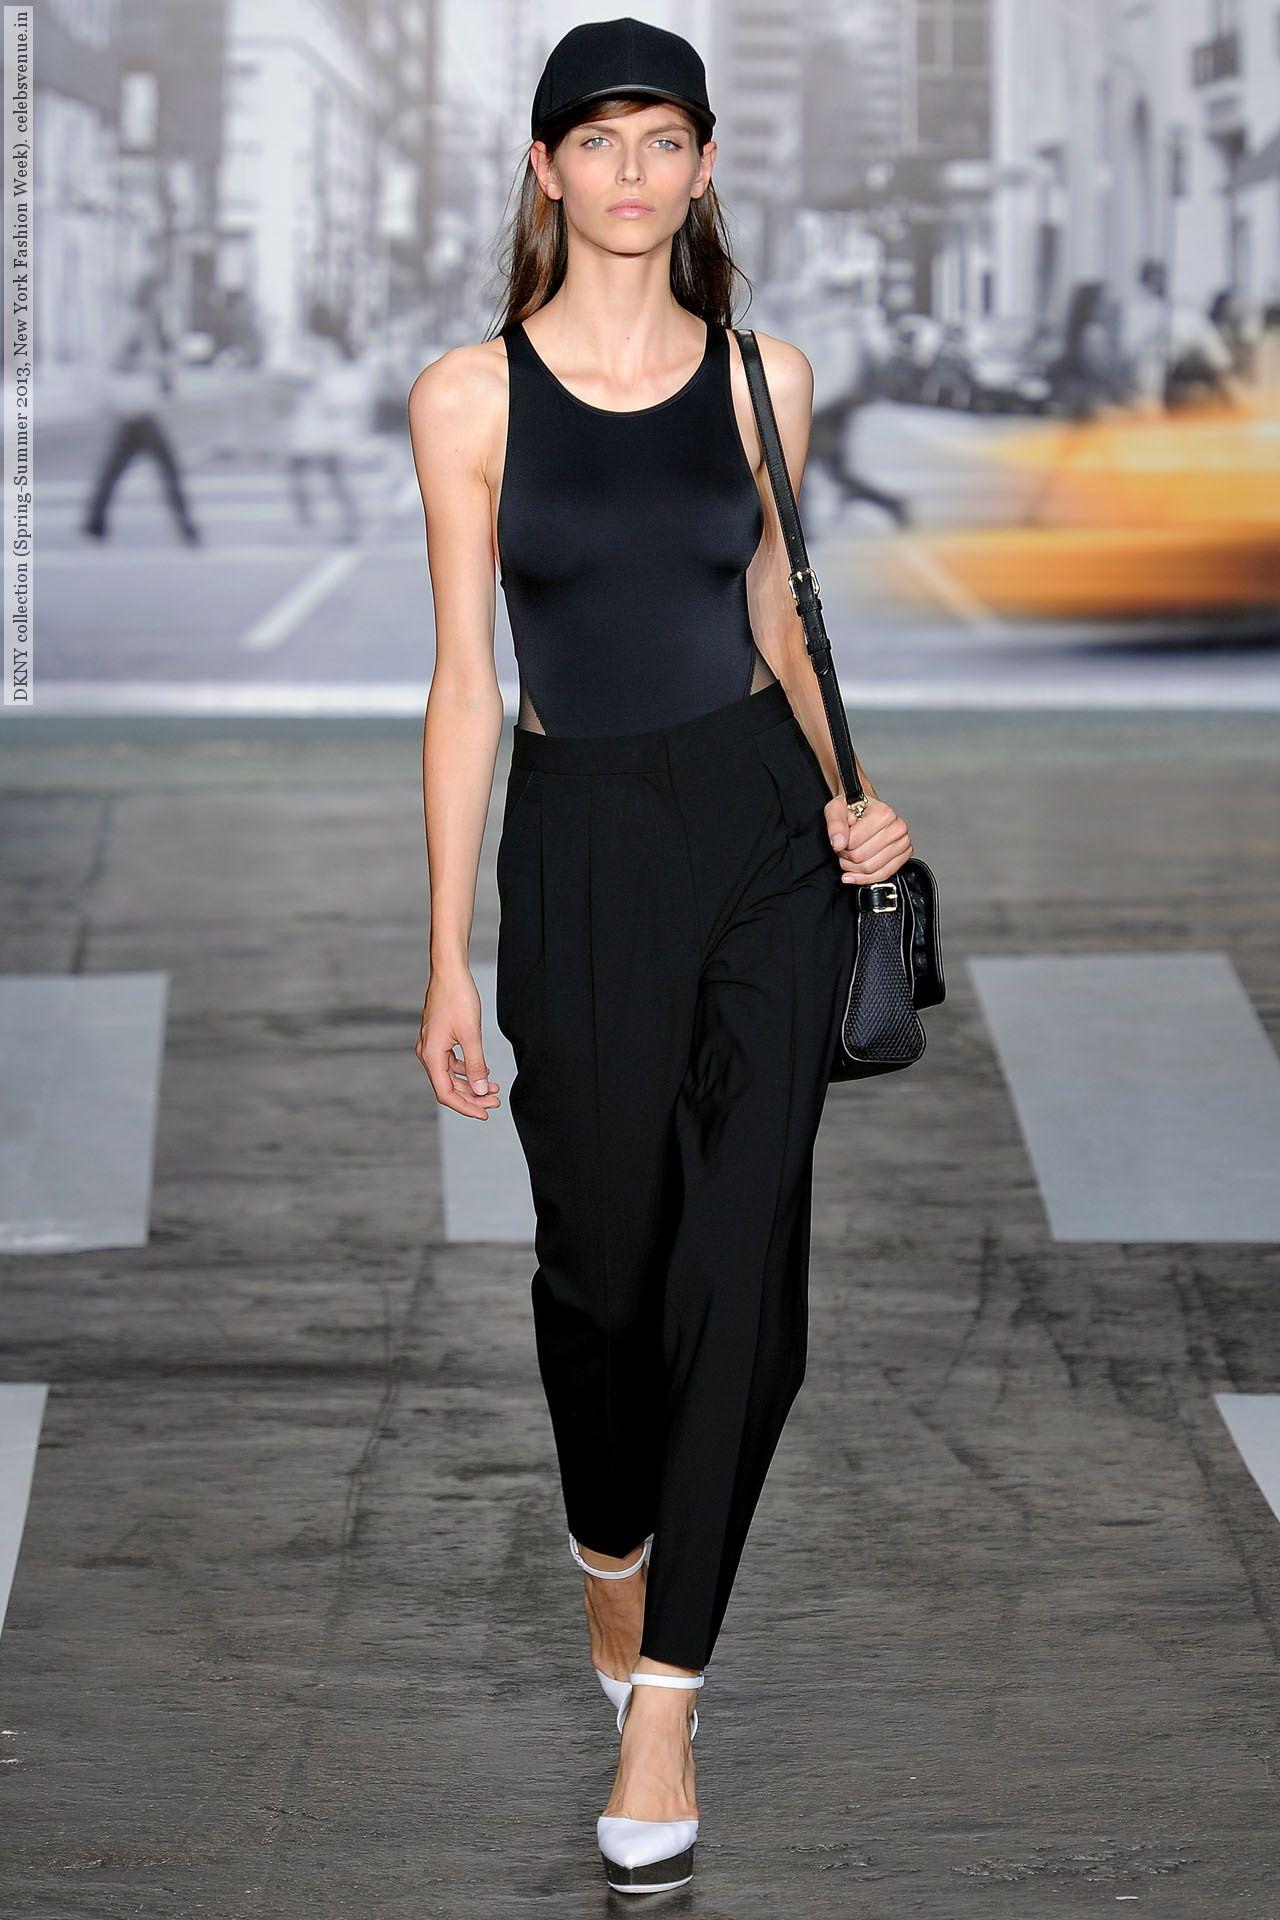 DKNY collection (Spring-Summer 2013, New York Fashion Week) 021.jpg